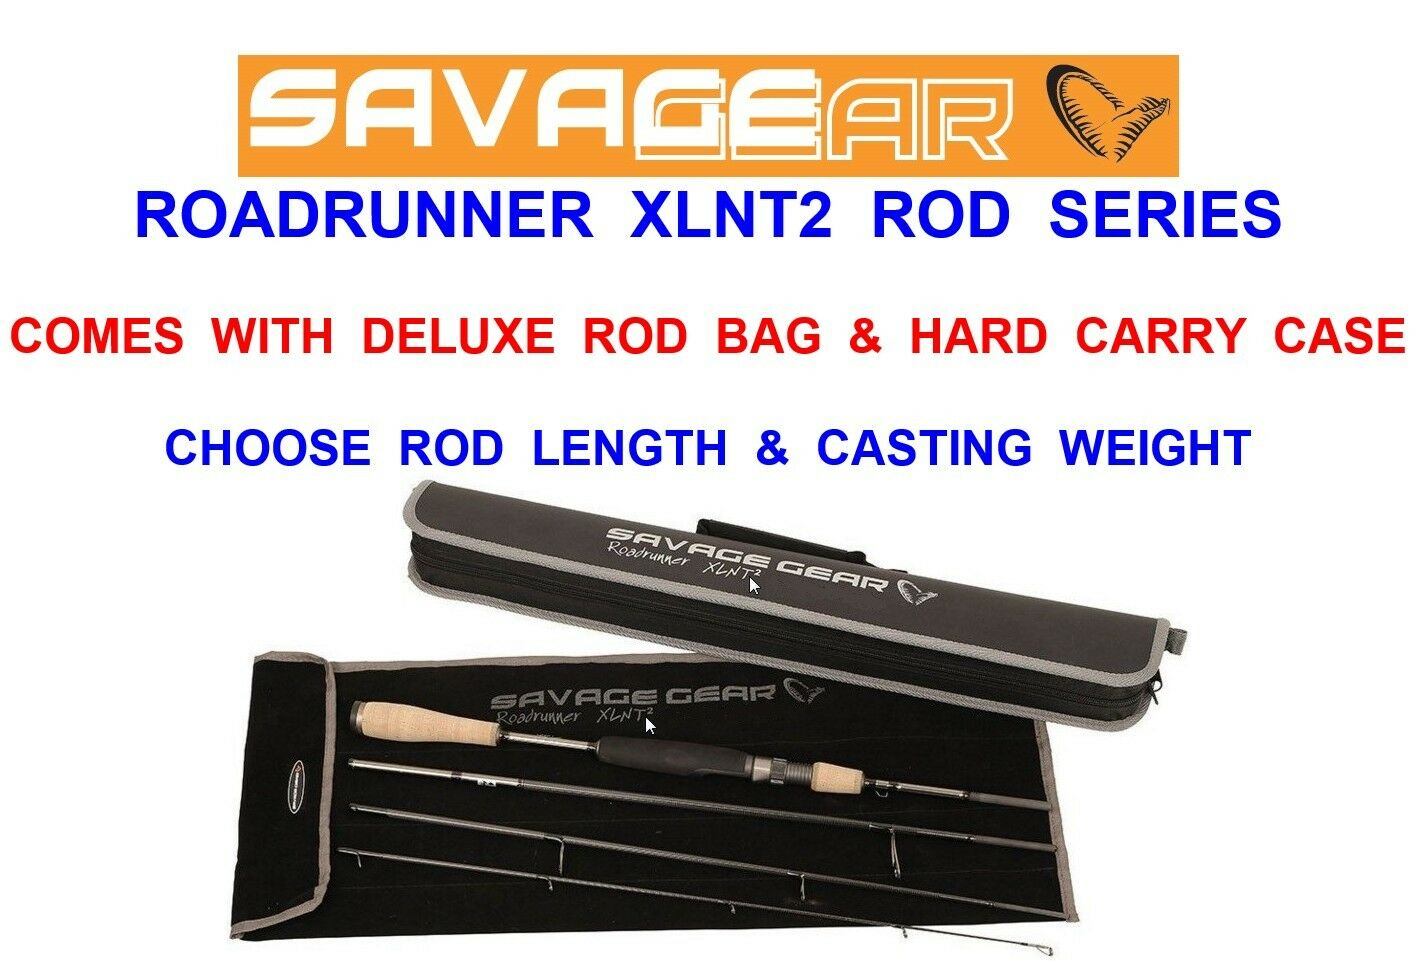 CLEARANCE SAVAGE GEAR XLNT2 ROAD RUNNER TRAVEL ROD SEA COARSE FISHING SPINNING